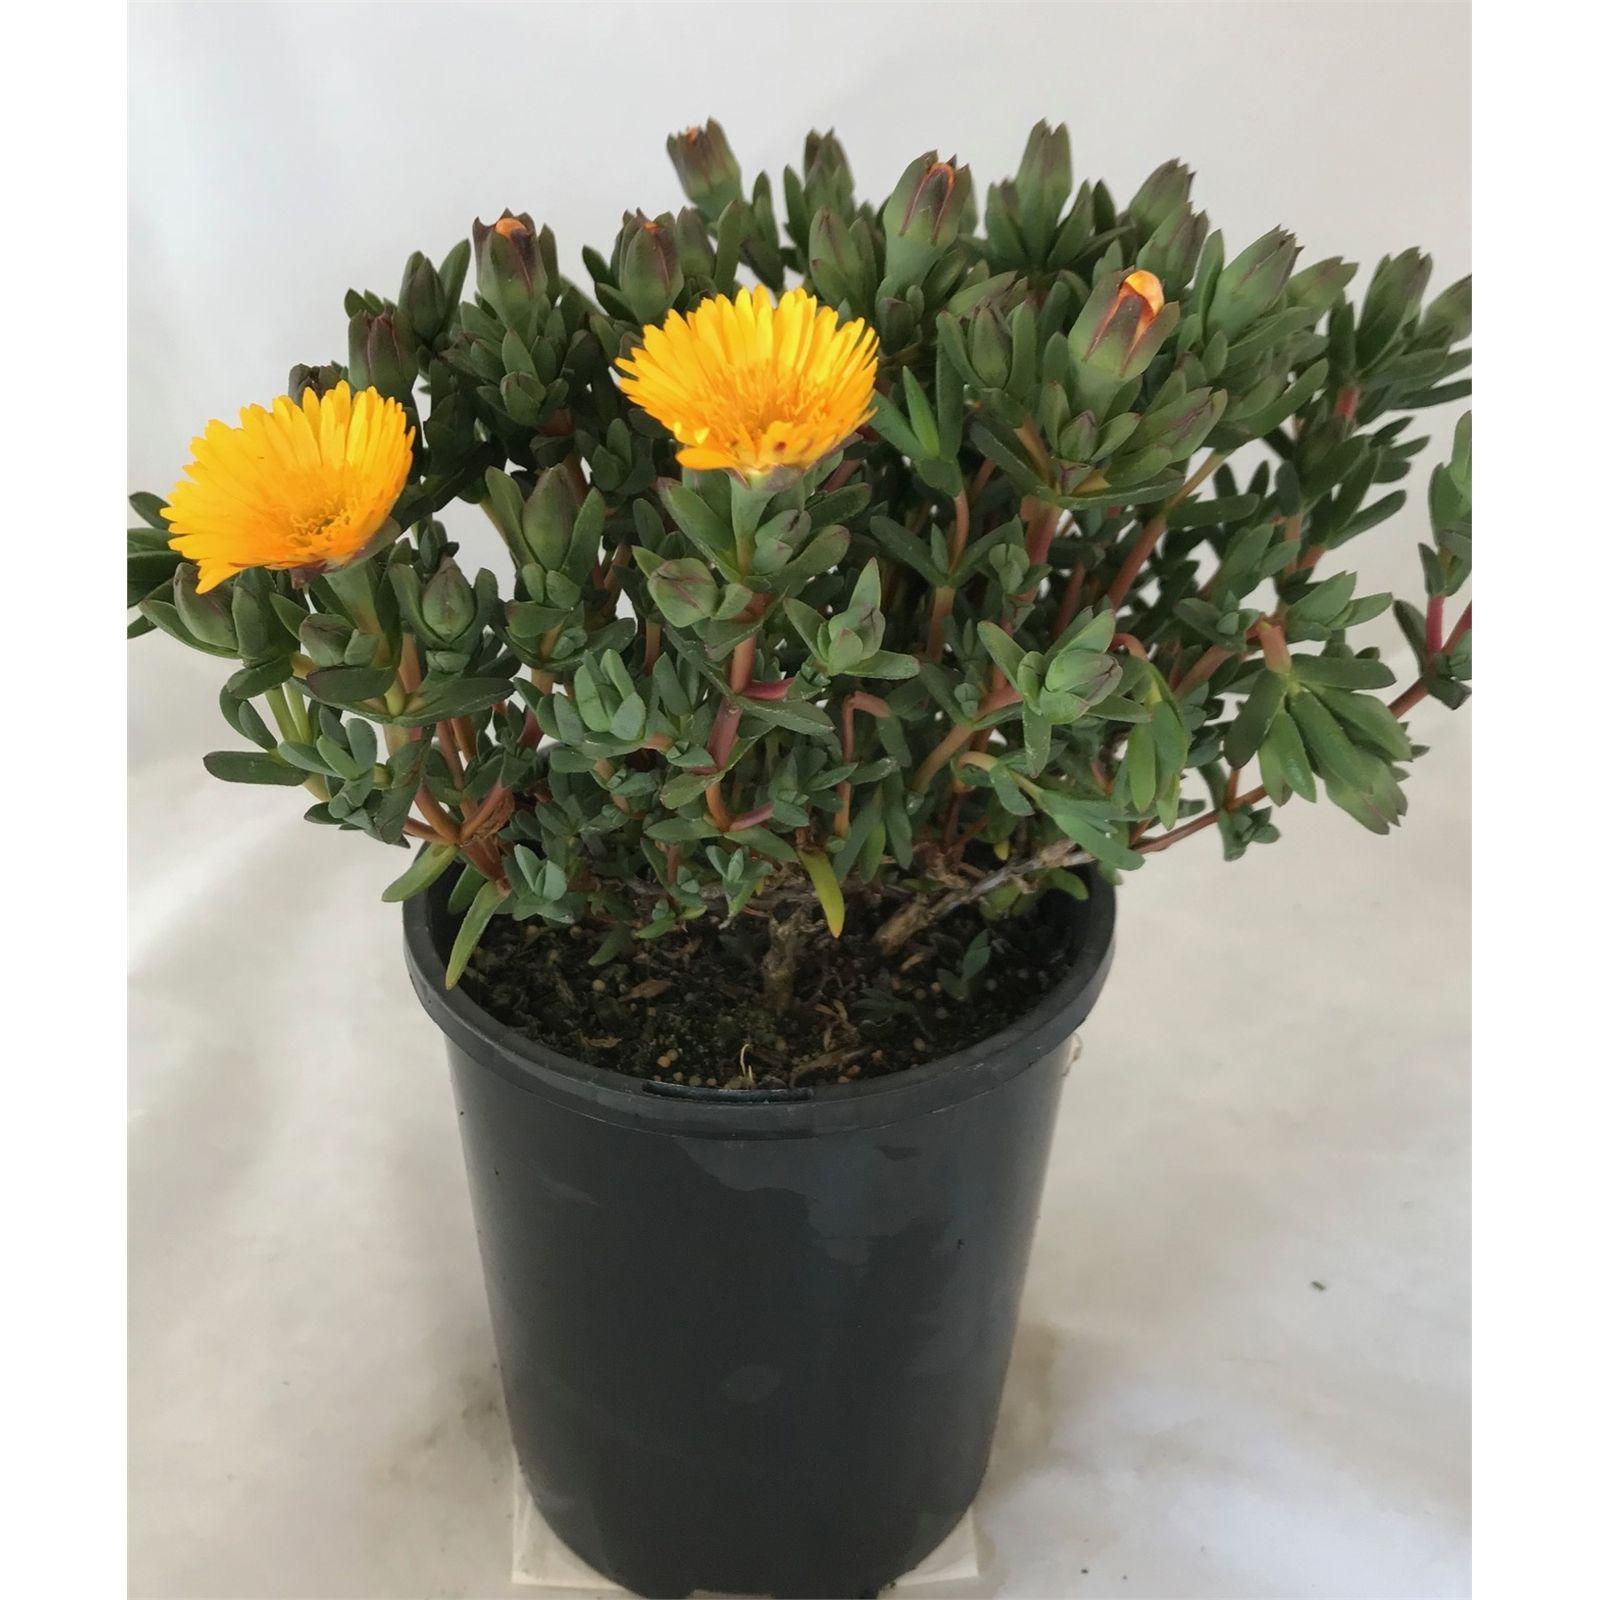 140mm Yellow Pig Face Mesembryanthemum crystallinum